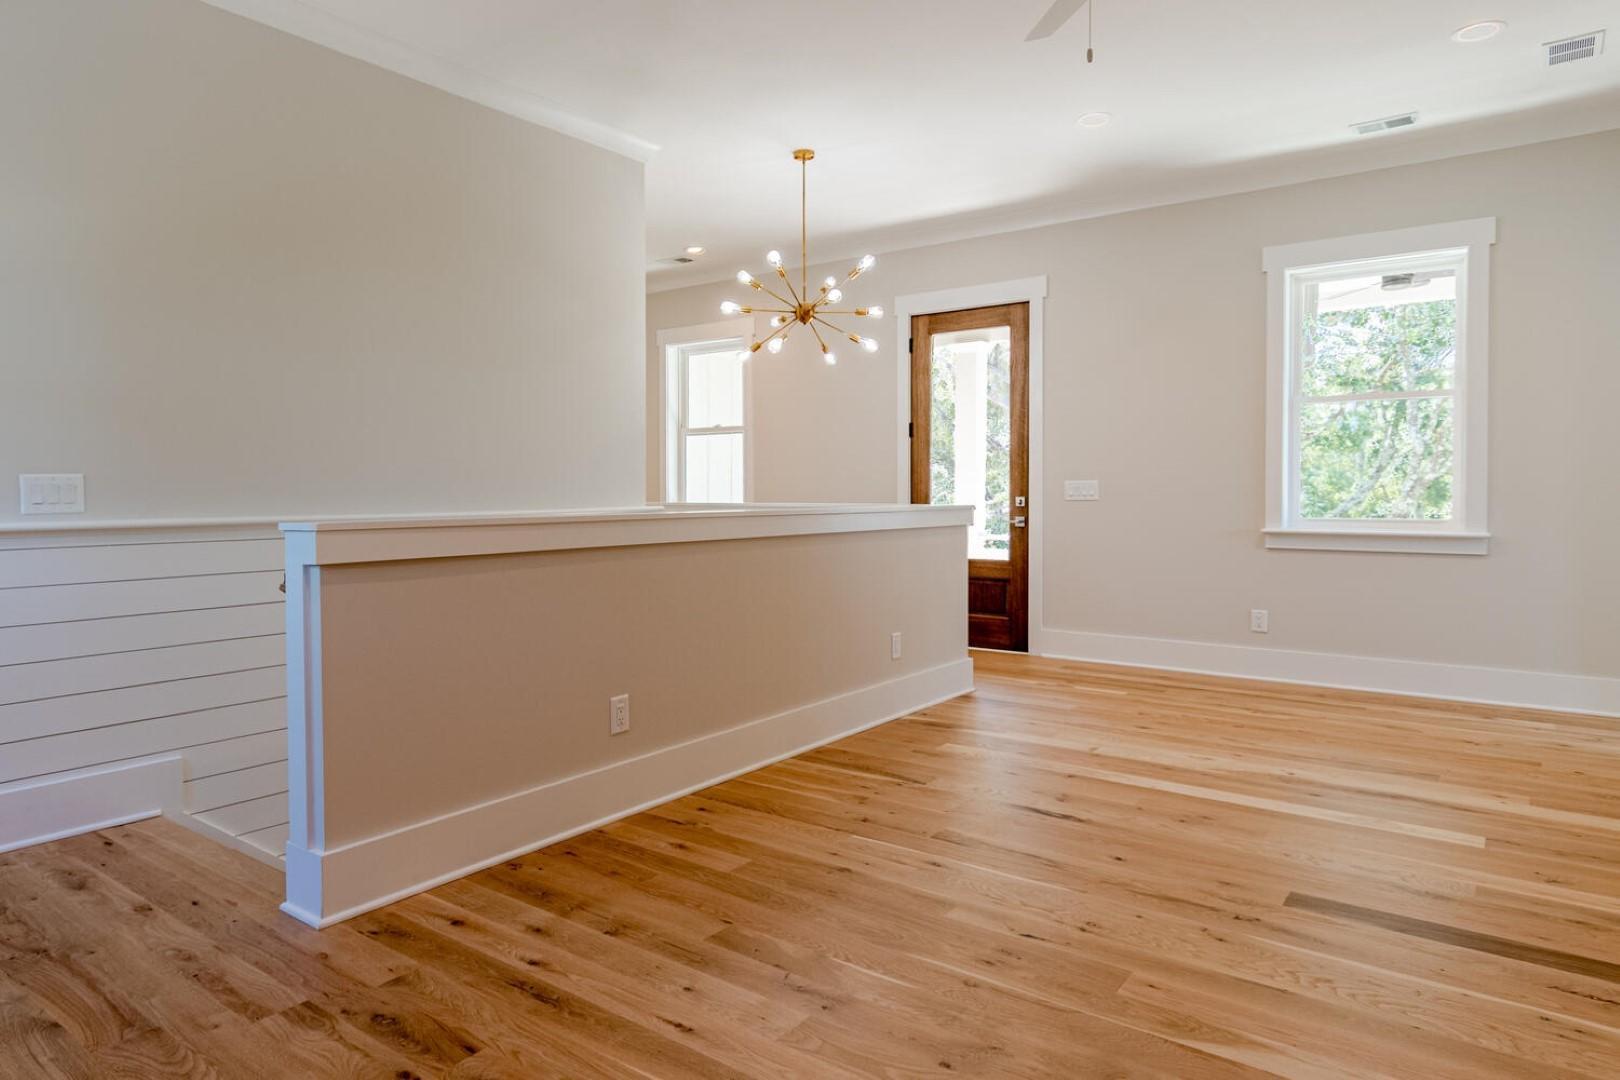 Scanlonville Homes For Sale - 156 5th, Mount Pleasant, SC - 1